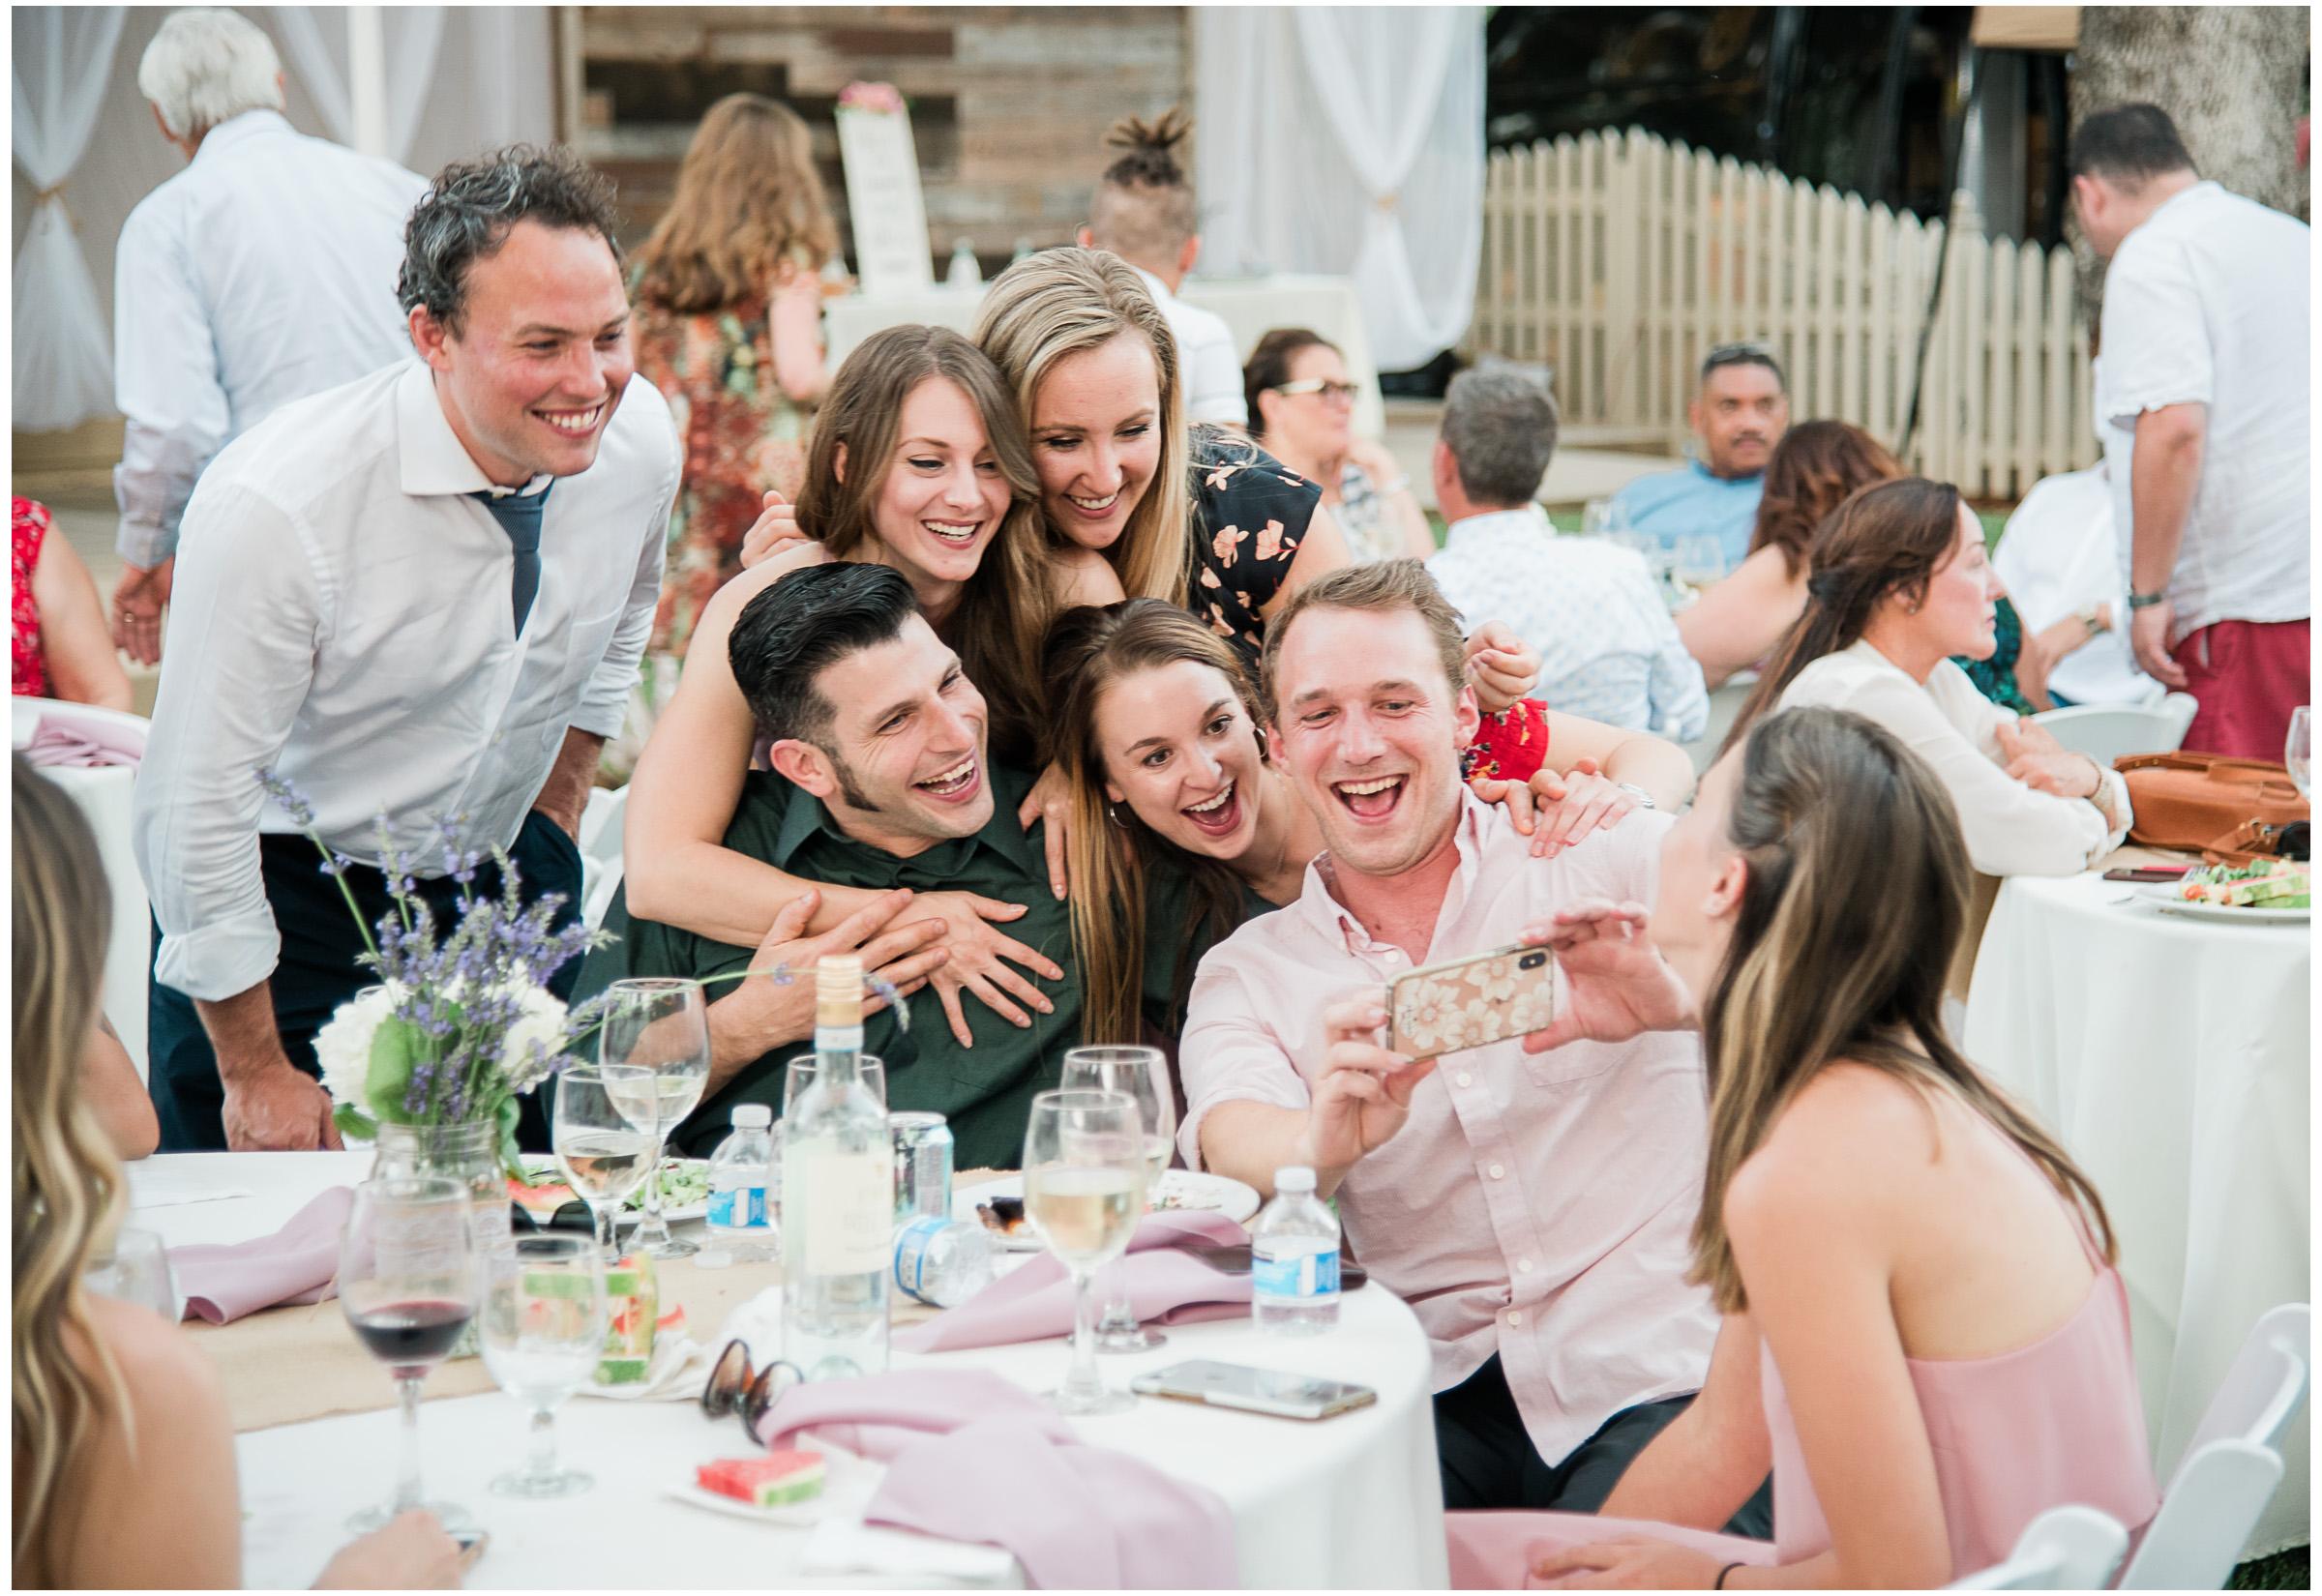 Placerville Wedding - Sacramento Photographer - Justin Wilcox Photography - 21.jpg